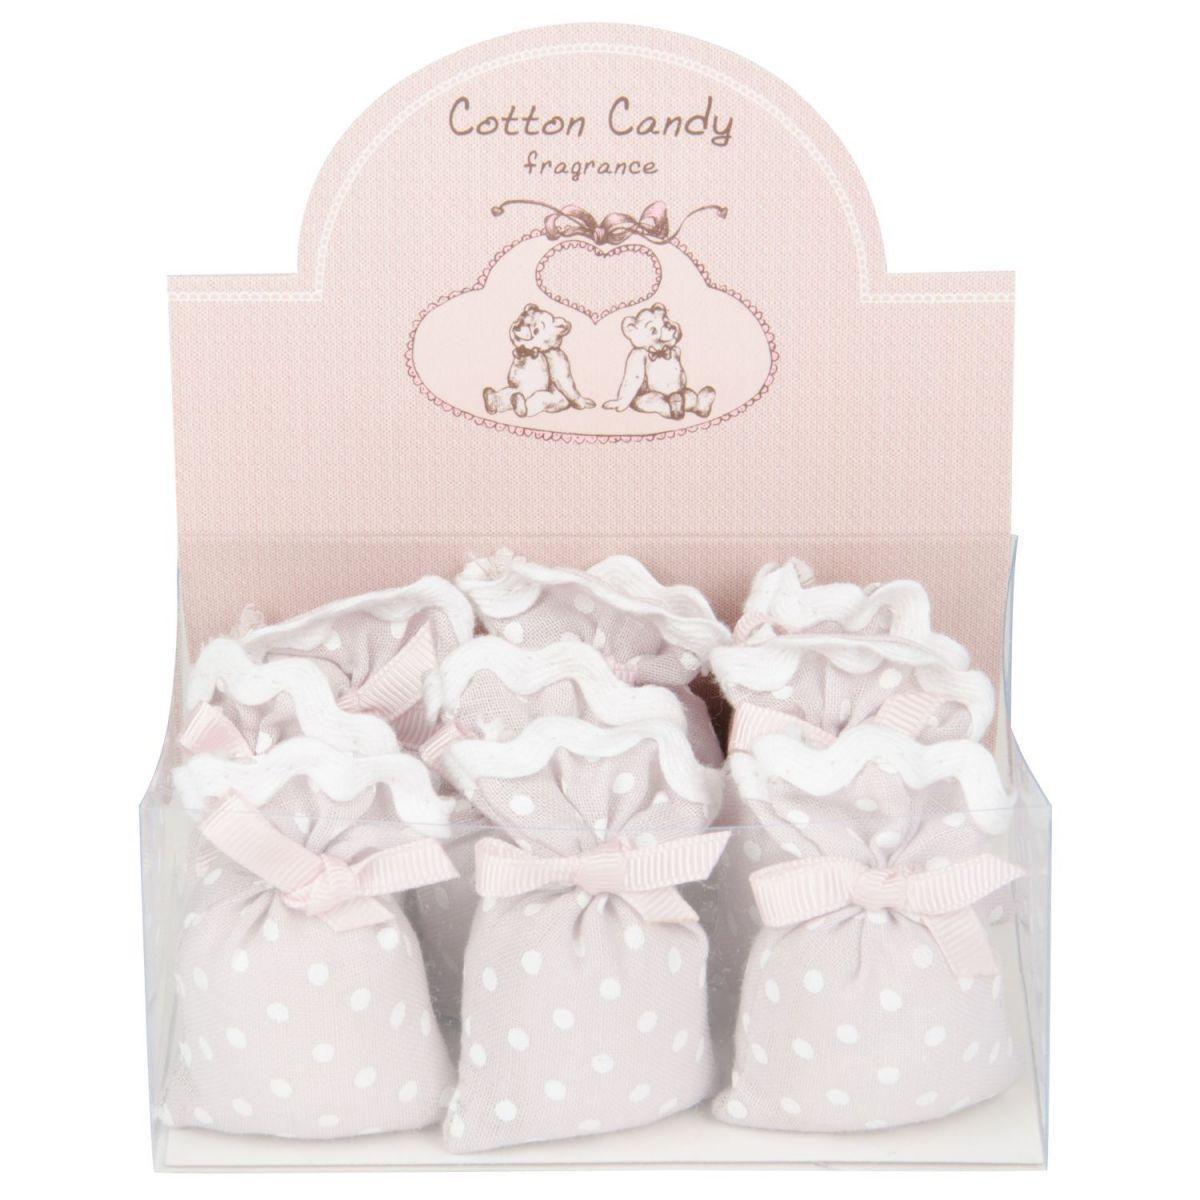 cotton candy linen sachet9 in giftbox de luxe pink